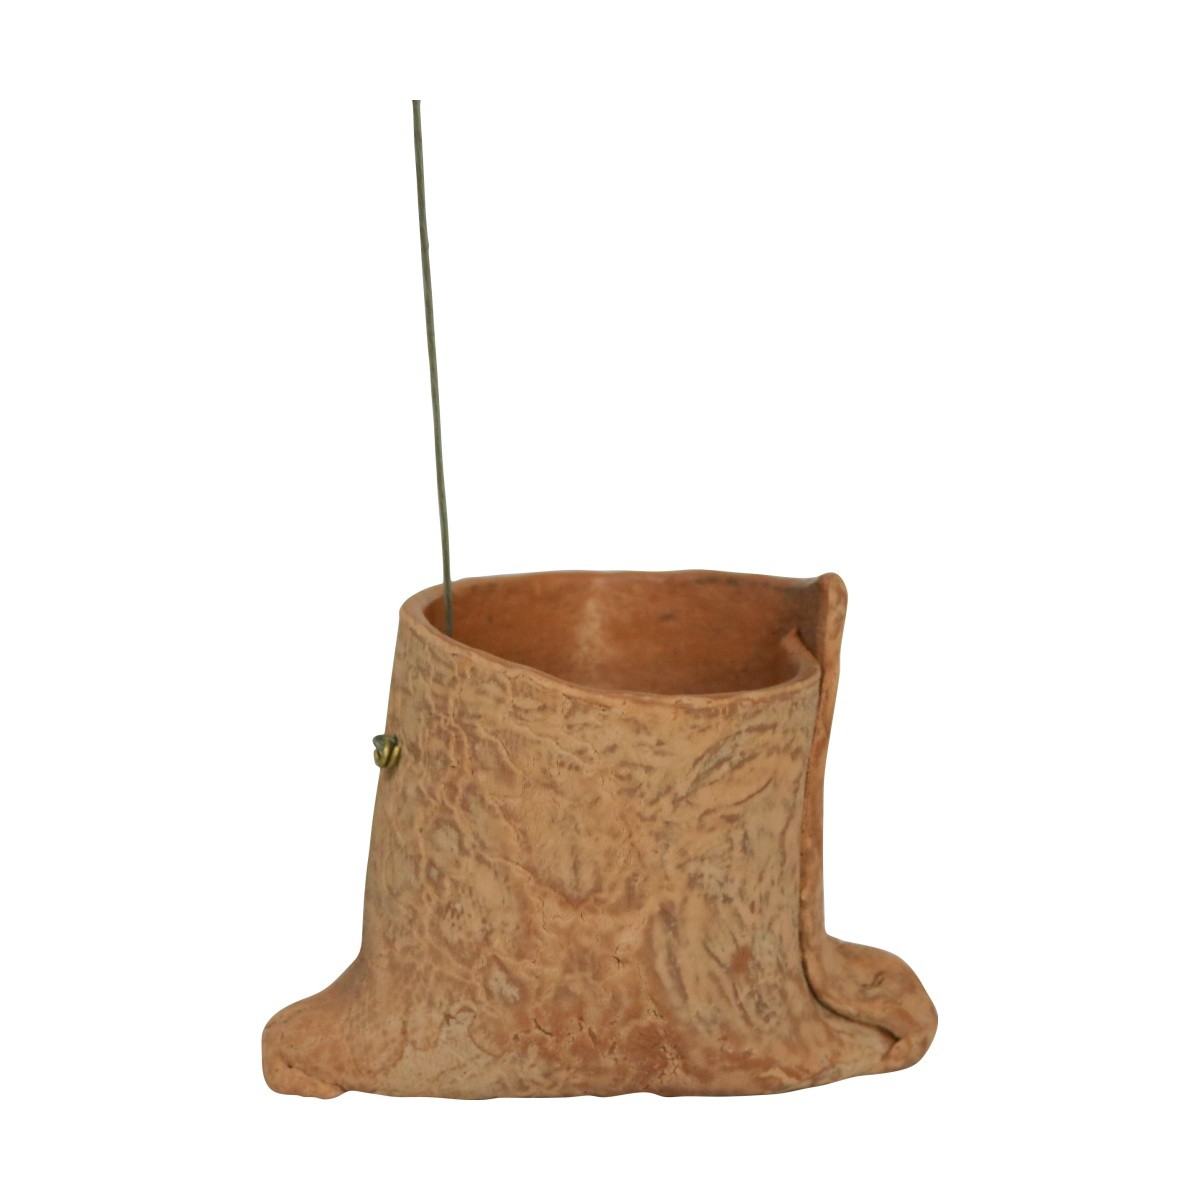 Vaso de barro Suspenso 11cm x 8,5cm Pequi 2